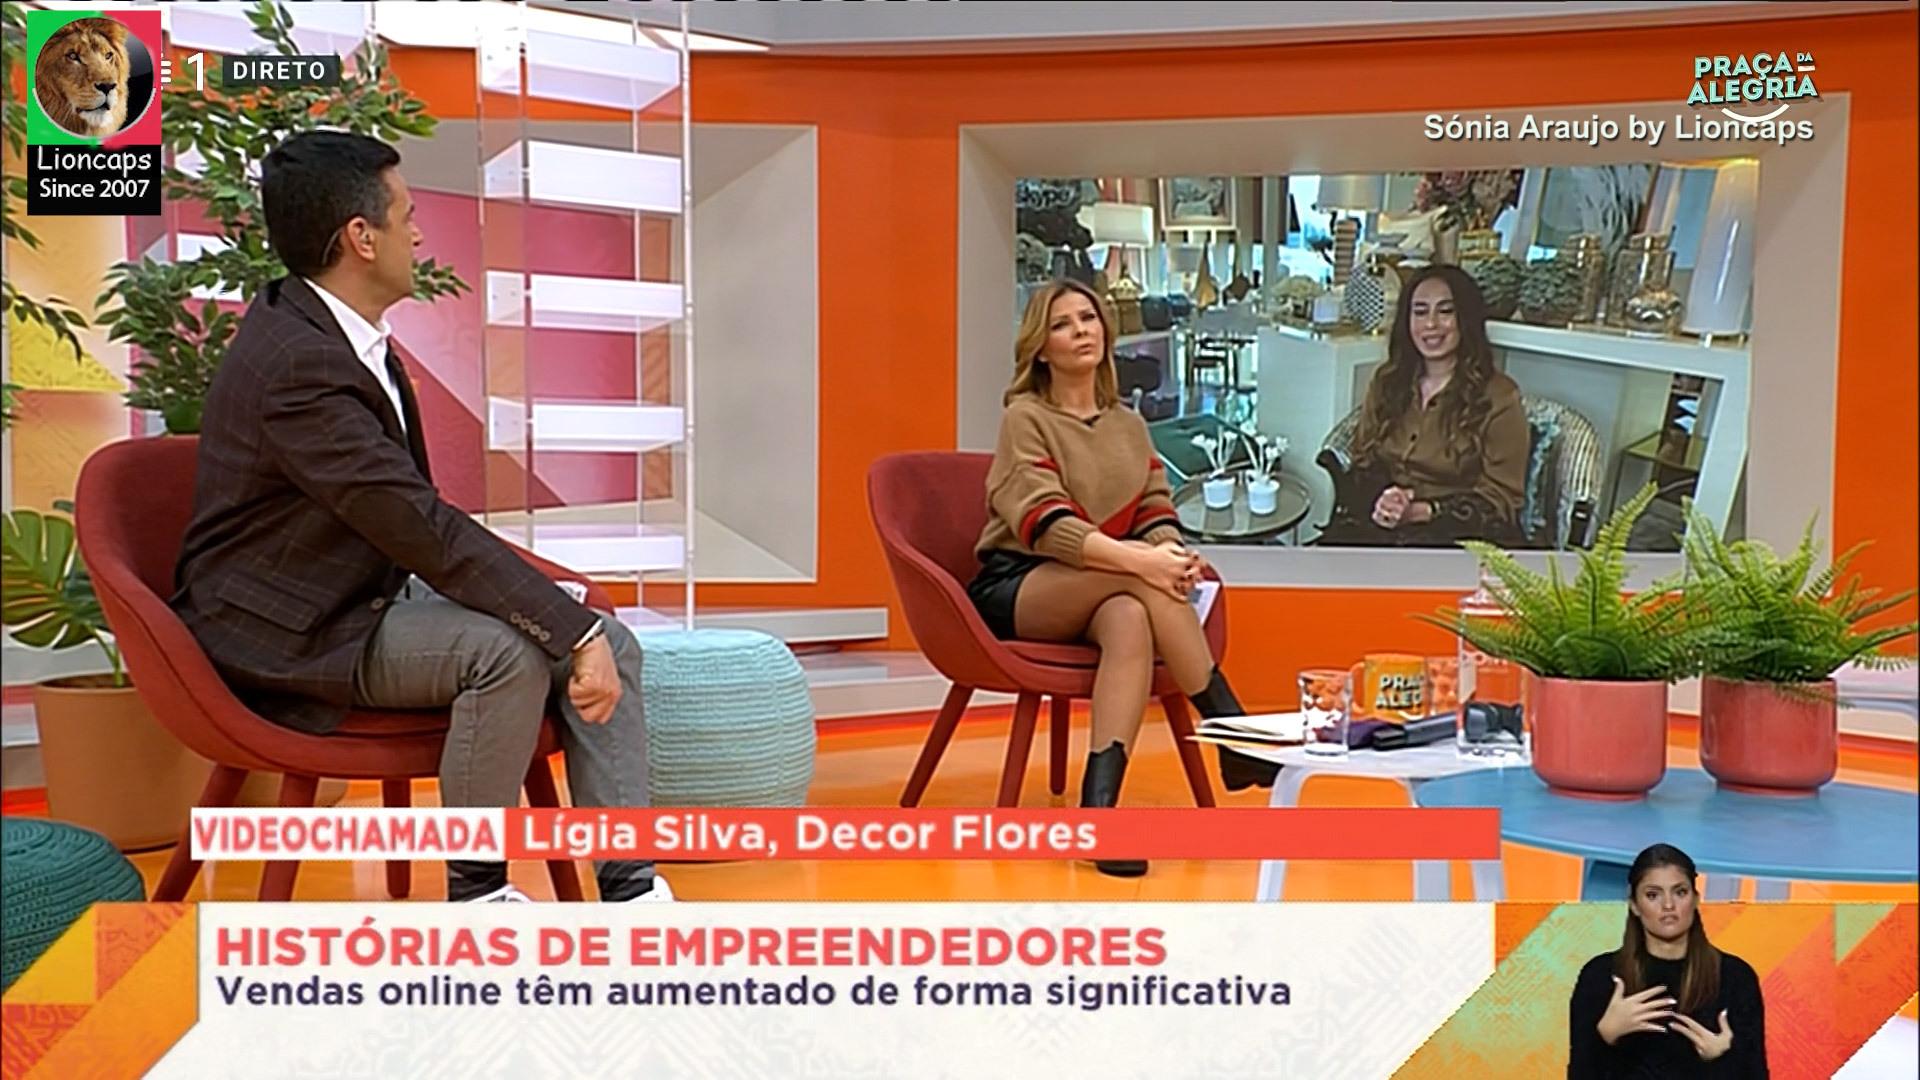 sonia_araujo_praca_lioncaps_27_03_2021_02 (19).jpg